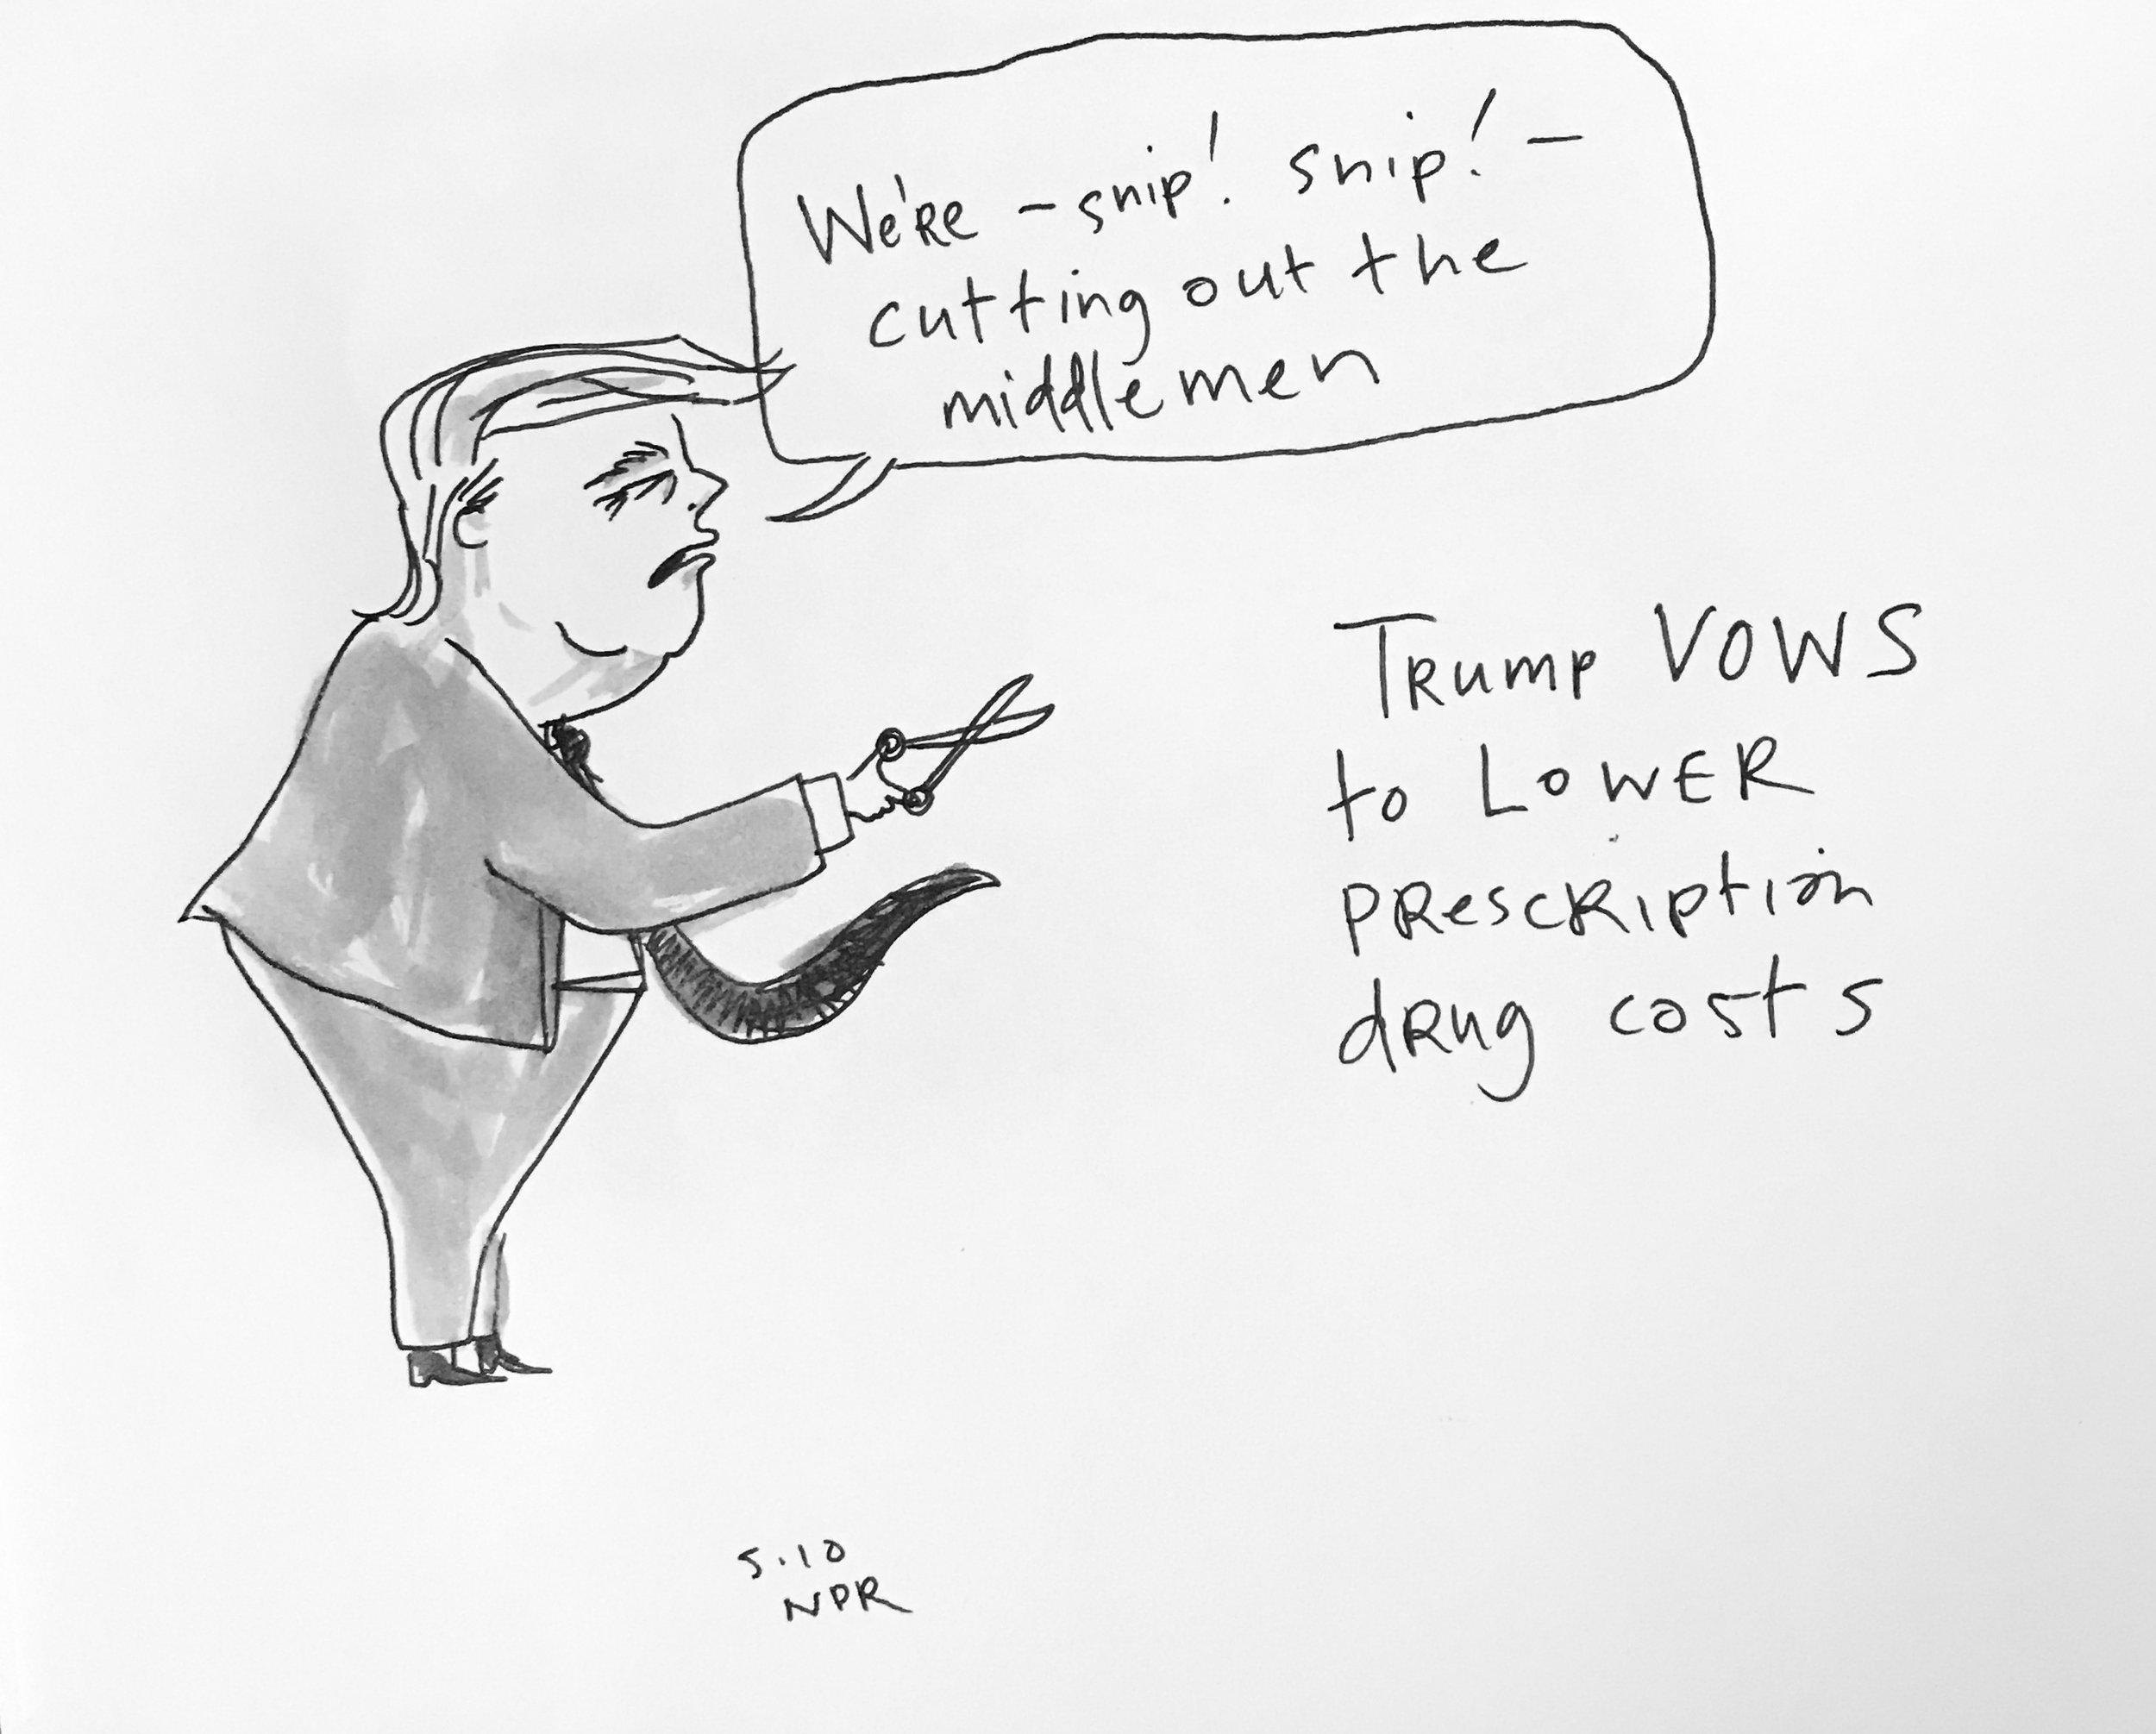 Trump DrawnfromtheHeadlines 051118.jpg